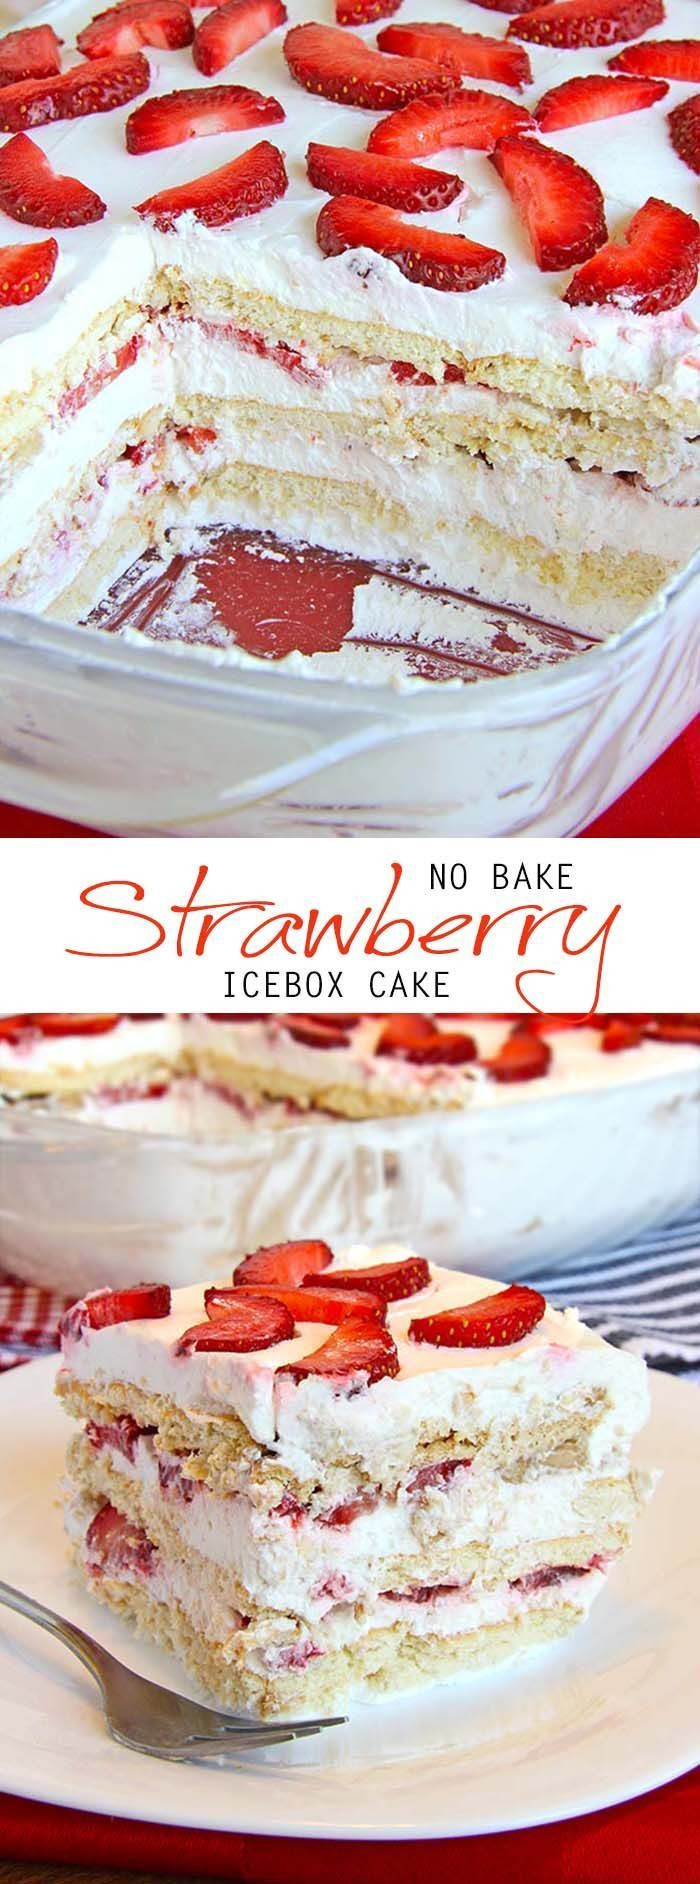 Quick Summer Desserts  No Bake Strawberry Icebox Cake Recipe